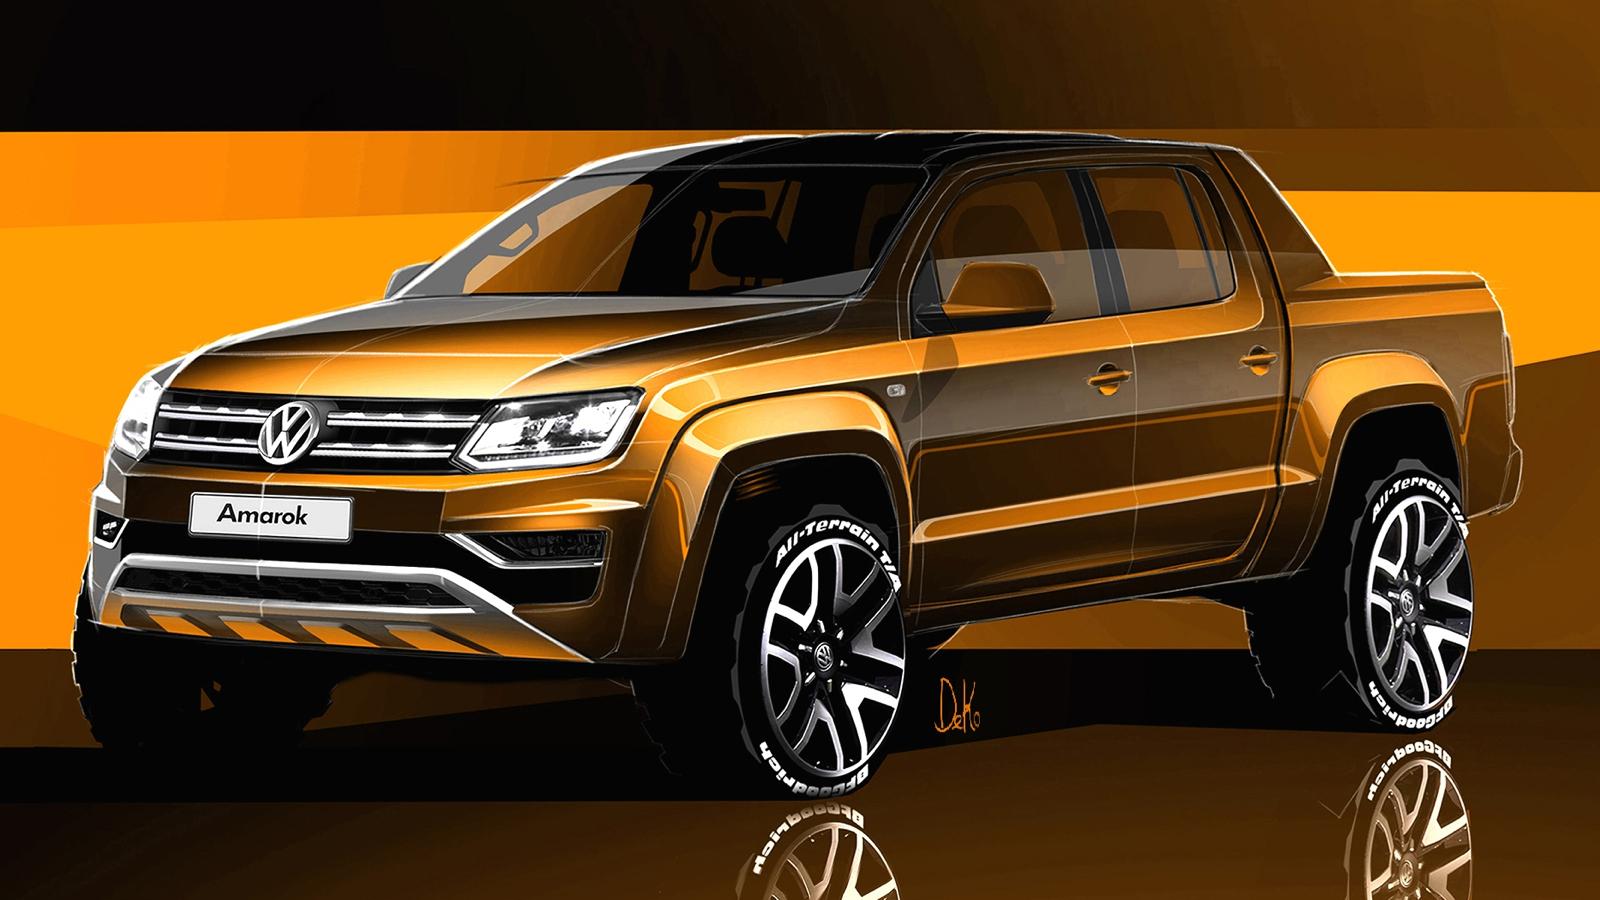 2017 Volkswagen Amarok sketches revealed - Photos (1 of 9)